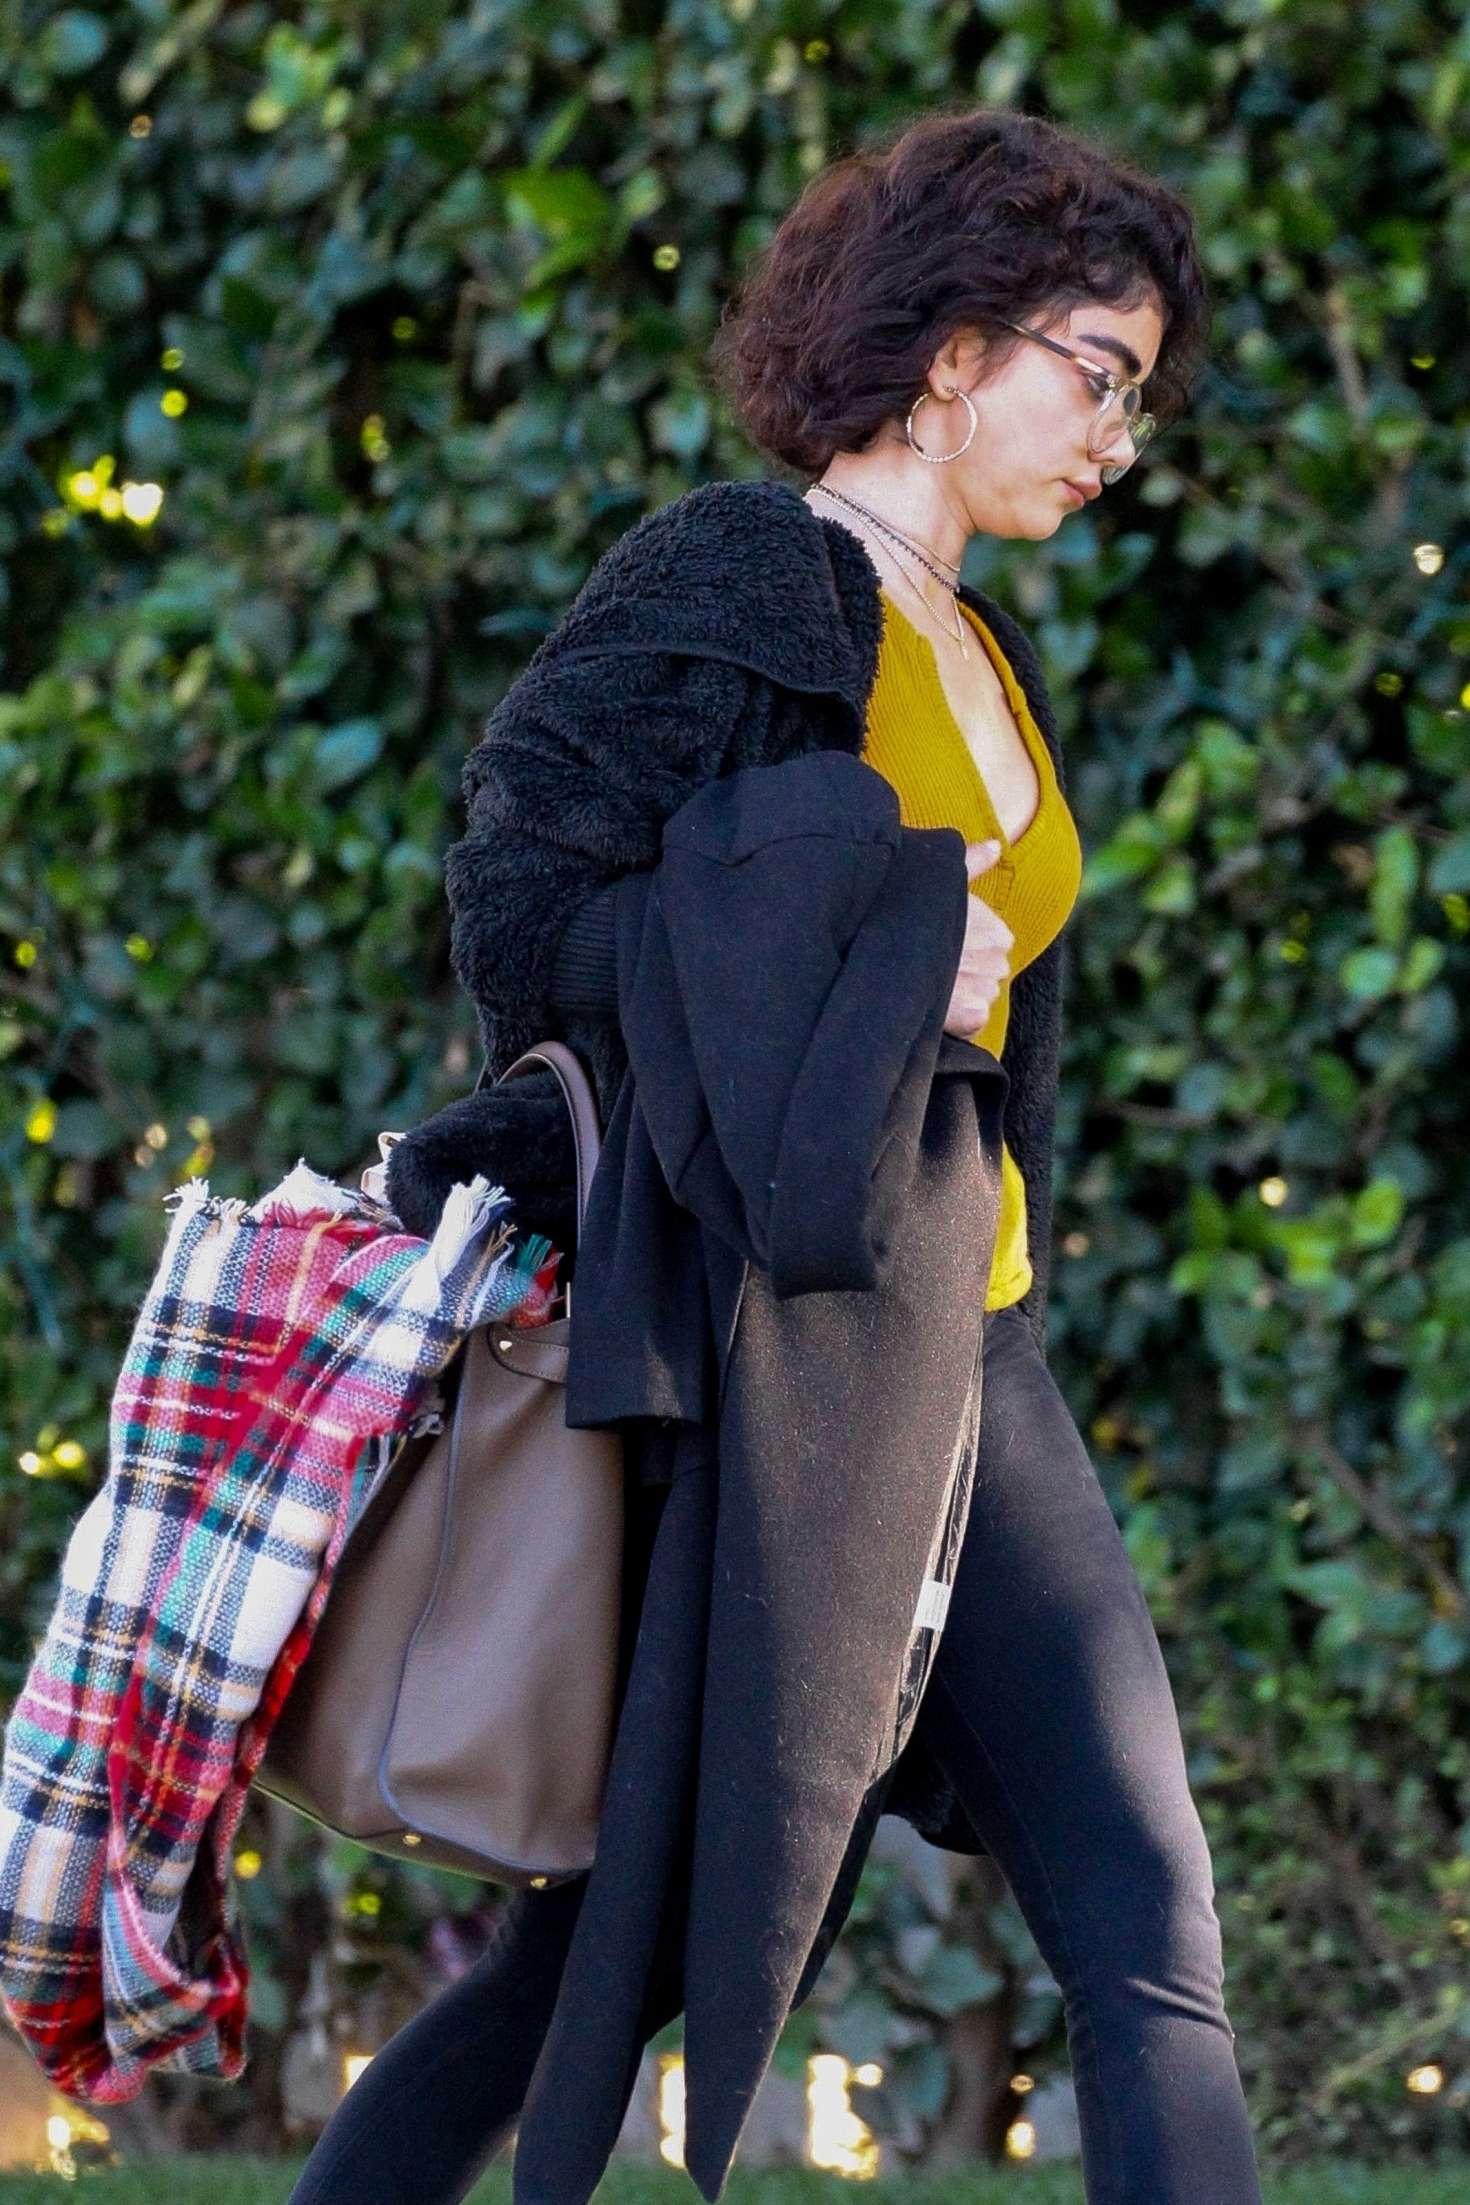 Sarah Hyland 2018 : Sarah Hyland: Out in Studio City -02